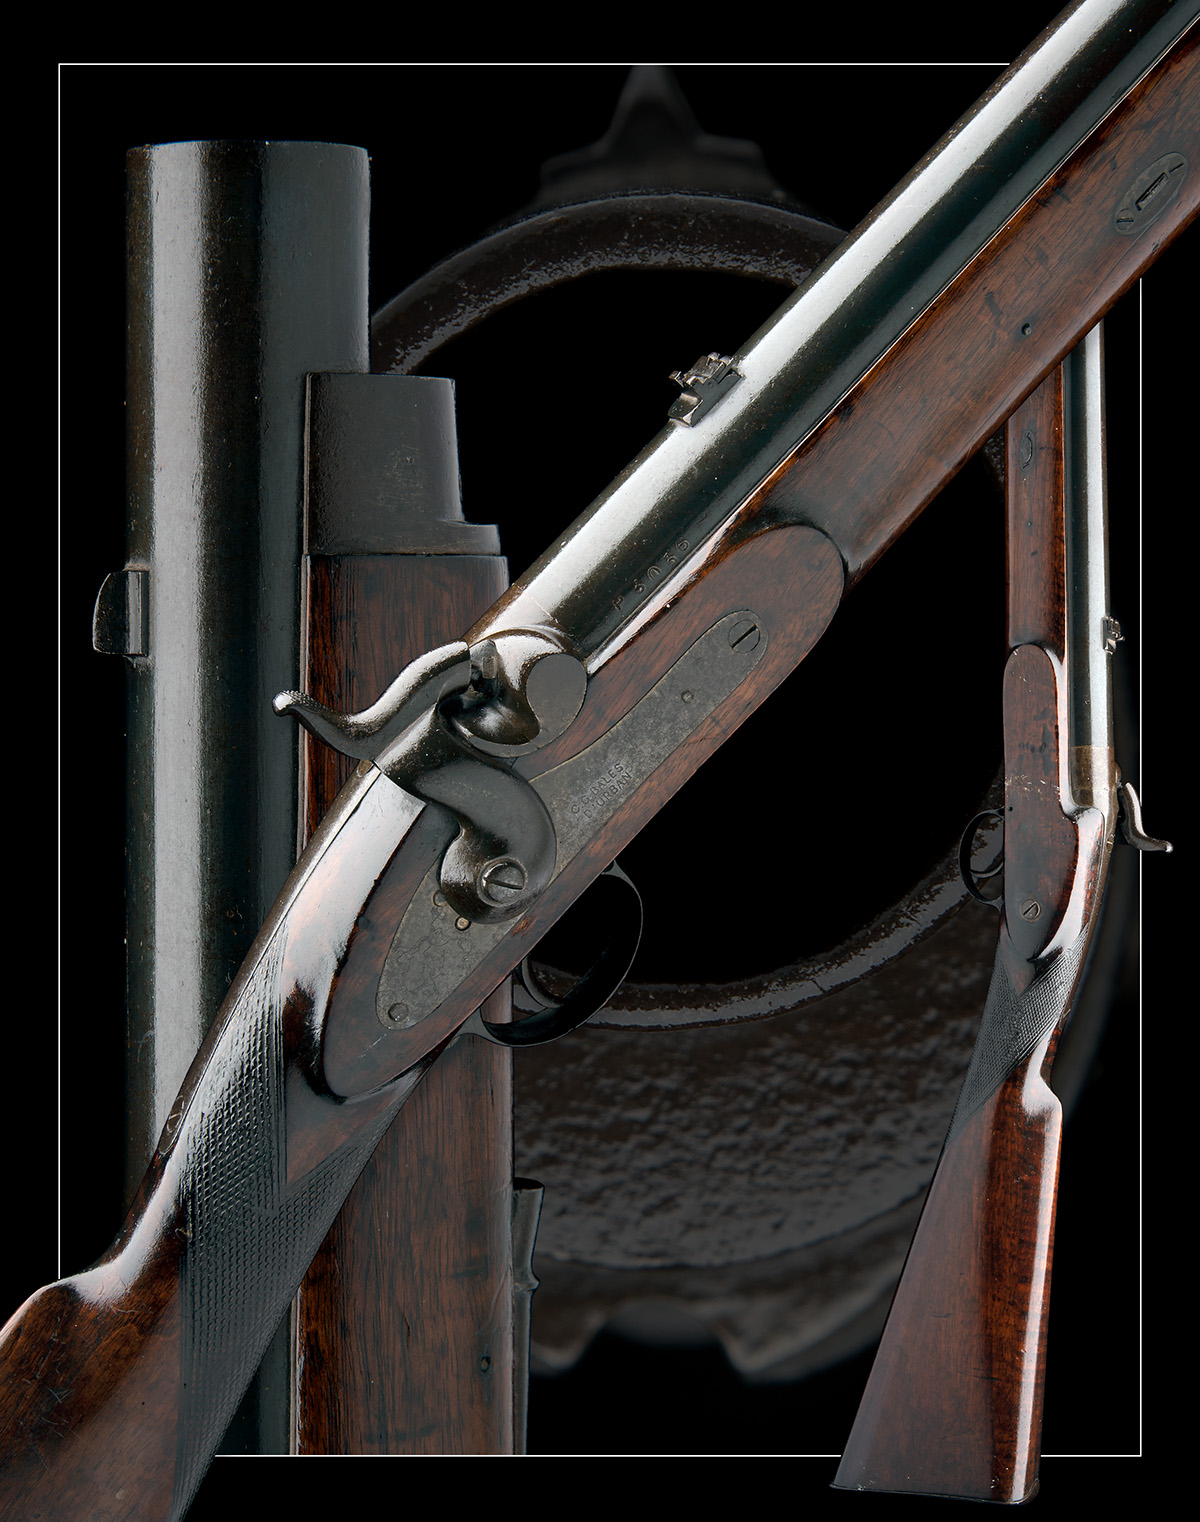 C.G. BALES, DURBAN, SOUTH AFRICA A RARE 4-BORE PERCUSSION RIFLED SHOT & BALL GUN FOR DANGEROUS GAME, - Image 10 of 10